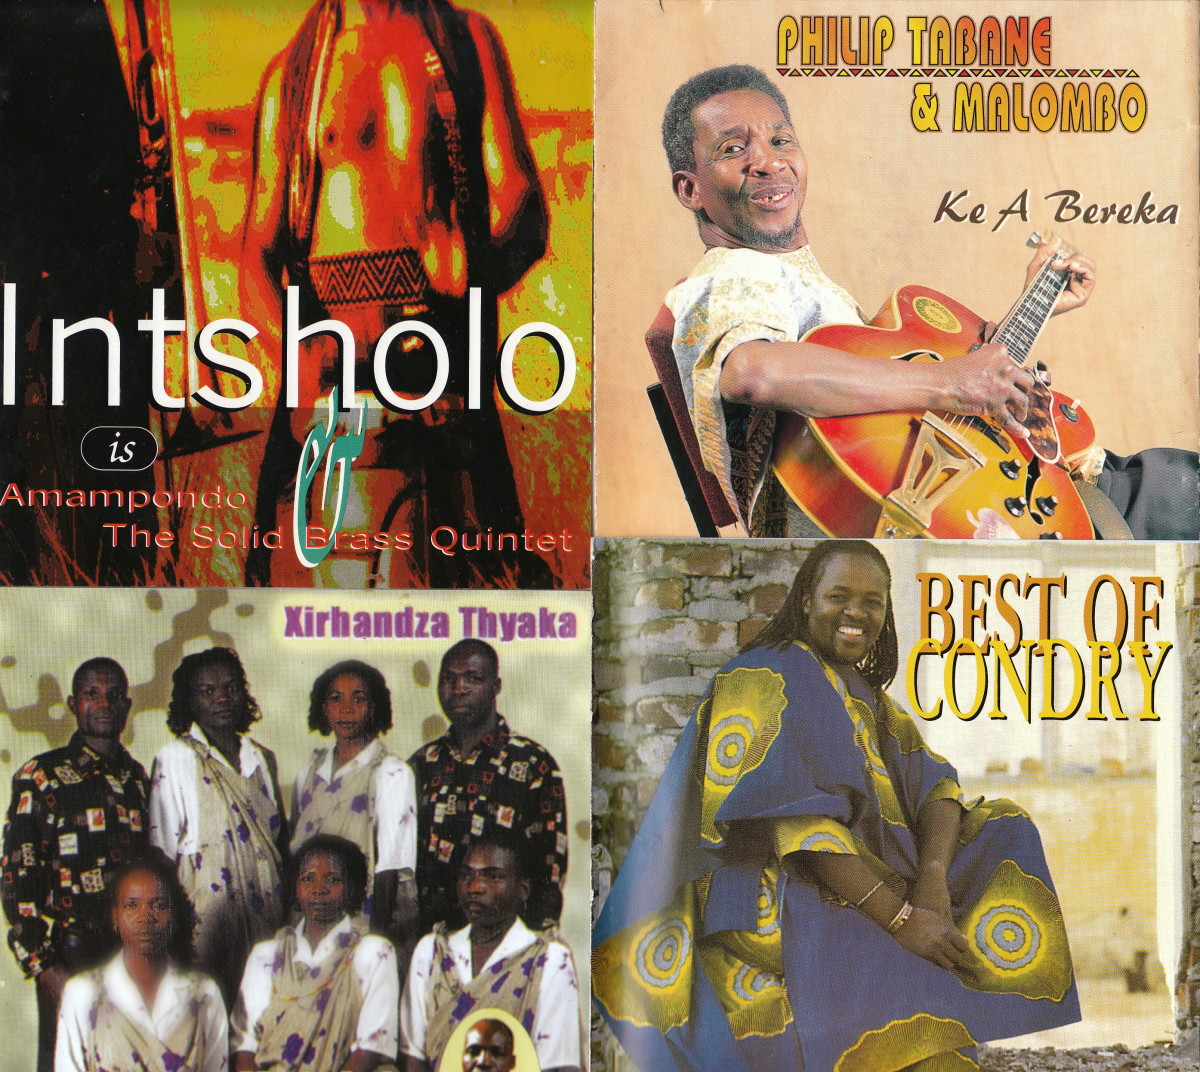 Intsholo-Amampondo; Phillip Tabane; George Maluleke na va N'wanati Sisters; Best of Condry Ziqubu